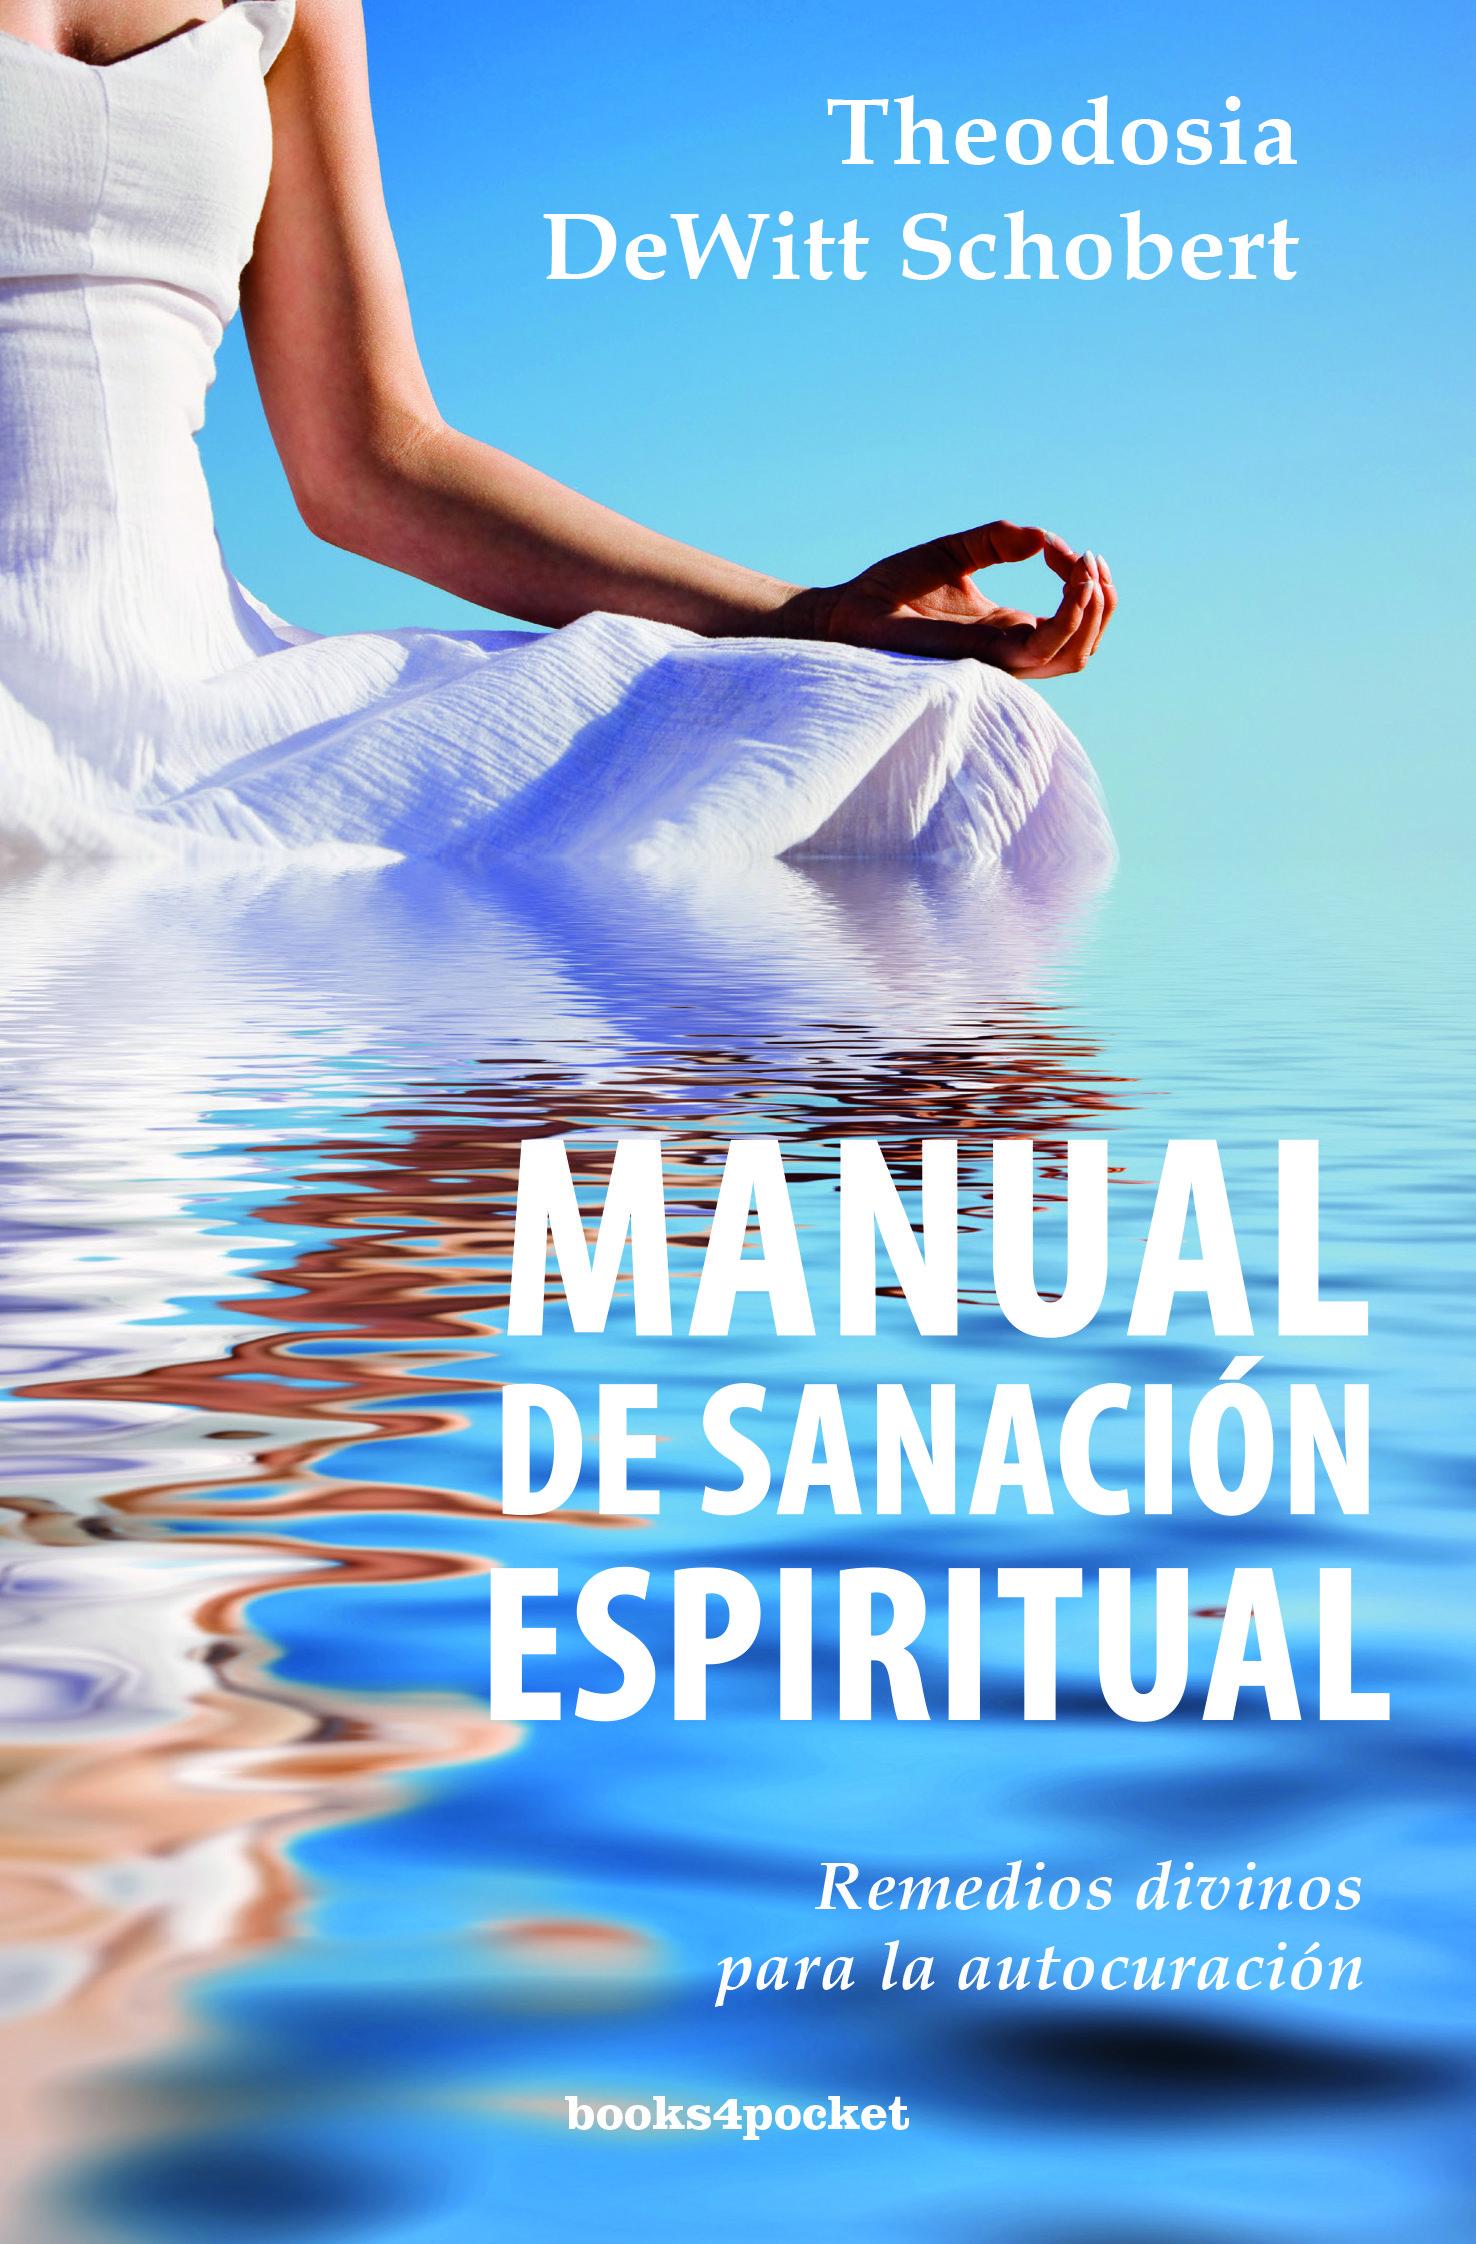 Manual De Sanacion Espiritual Theodosia Dewitt Schobert Comprar